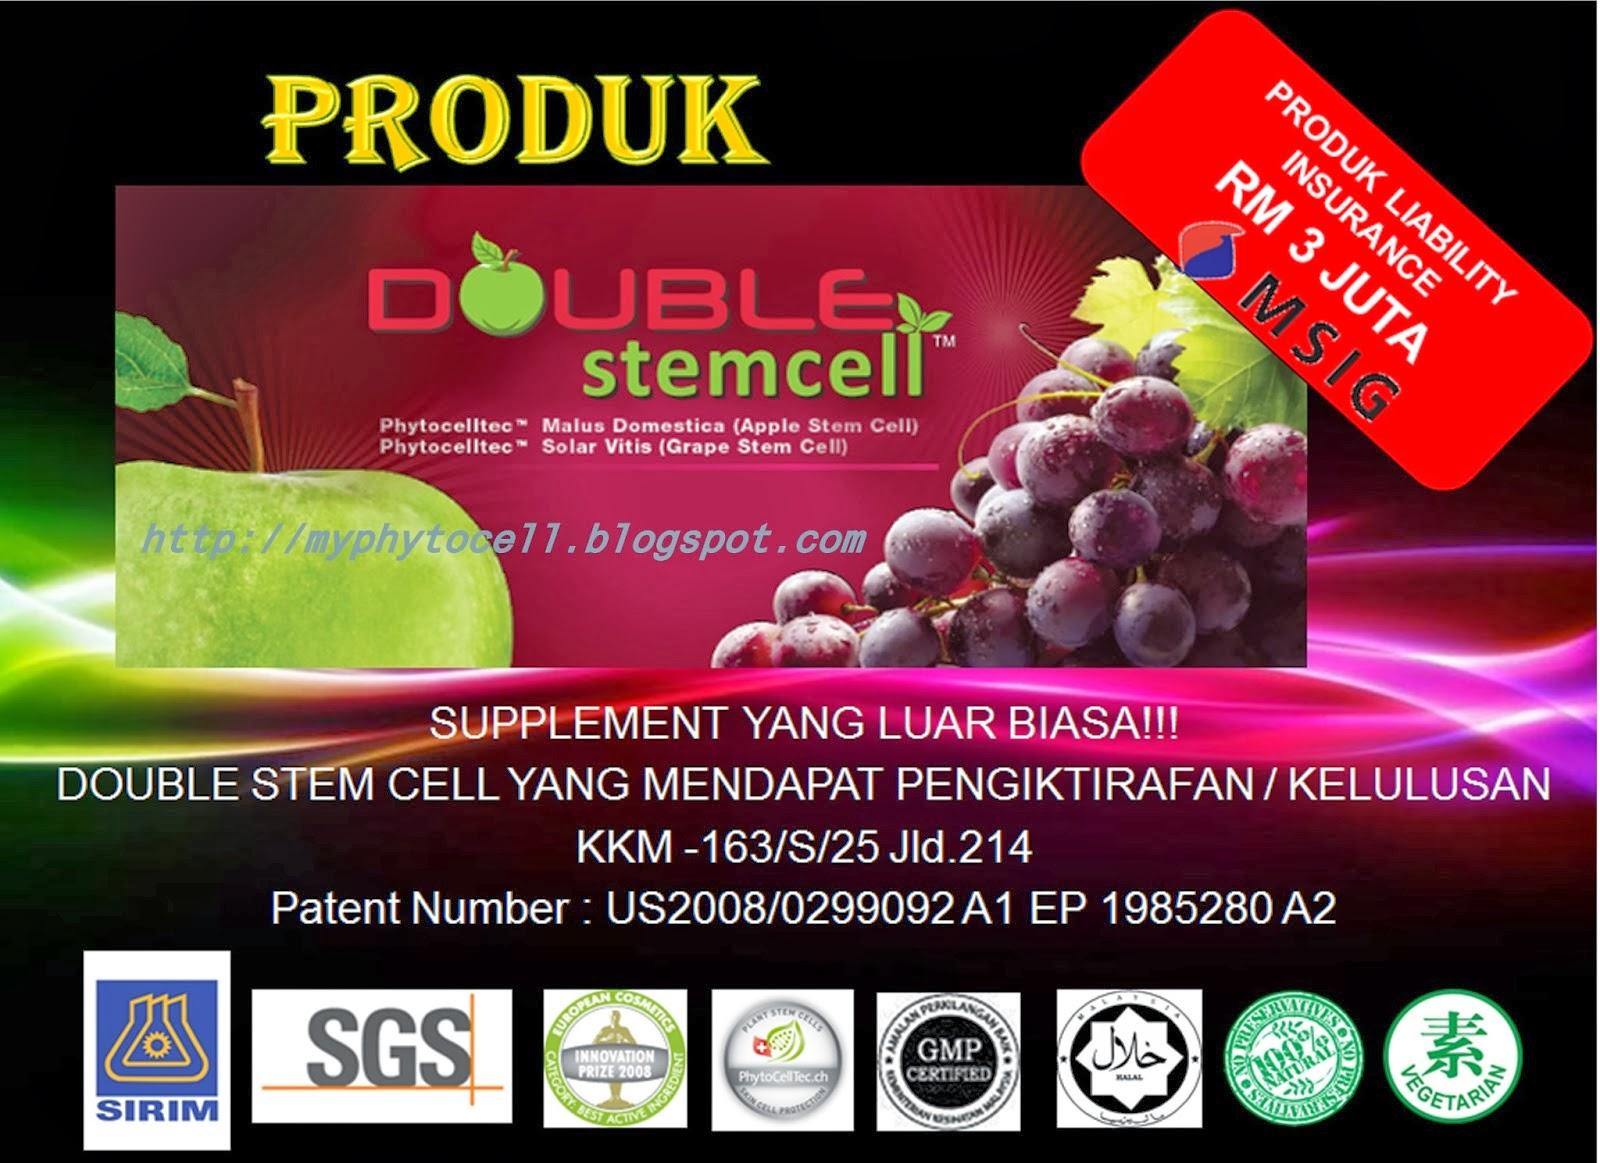 Double Stemcell - HEBAT